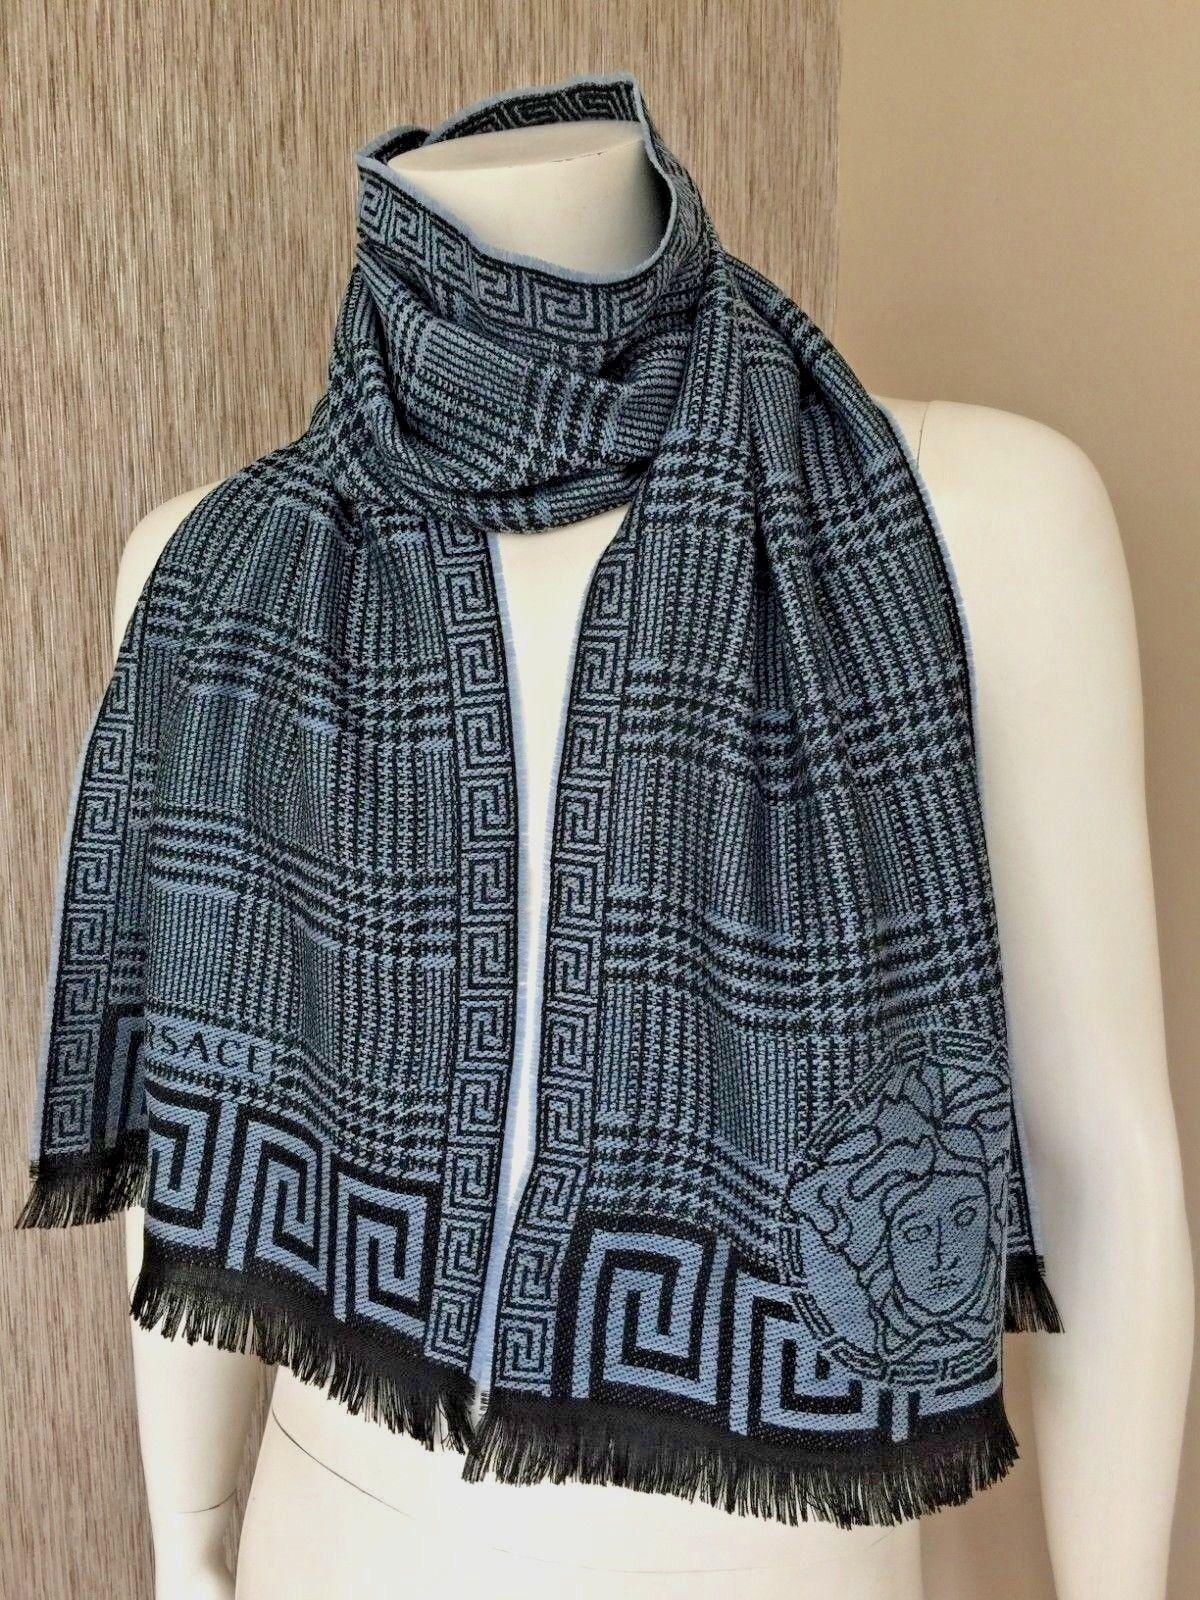 8c2b174252 Versace 100 Wool Medusa Head & Houndstooth Plaid Shawl Wrap Scarf Made in  Italy